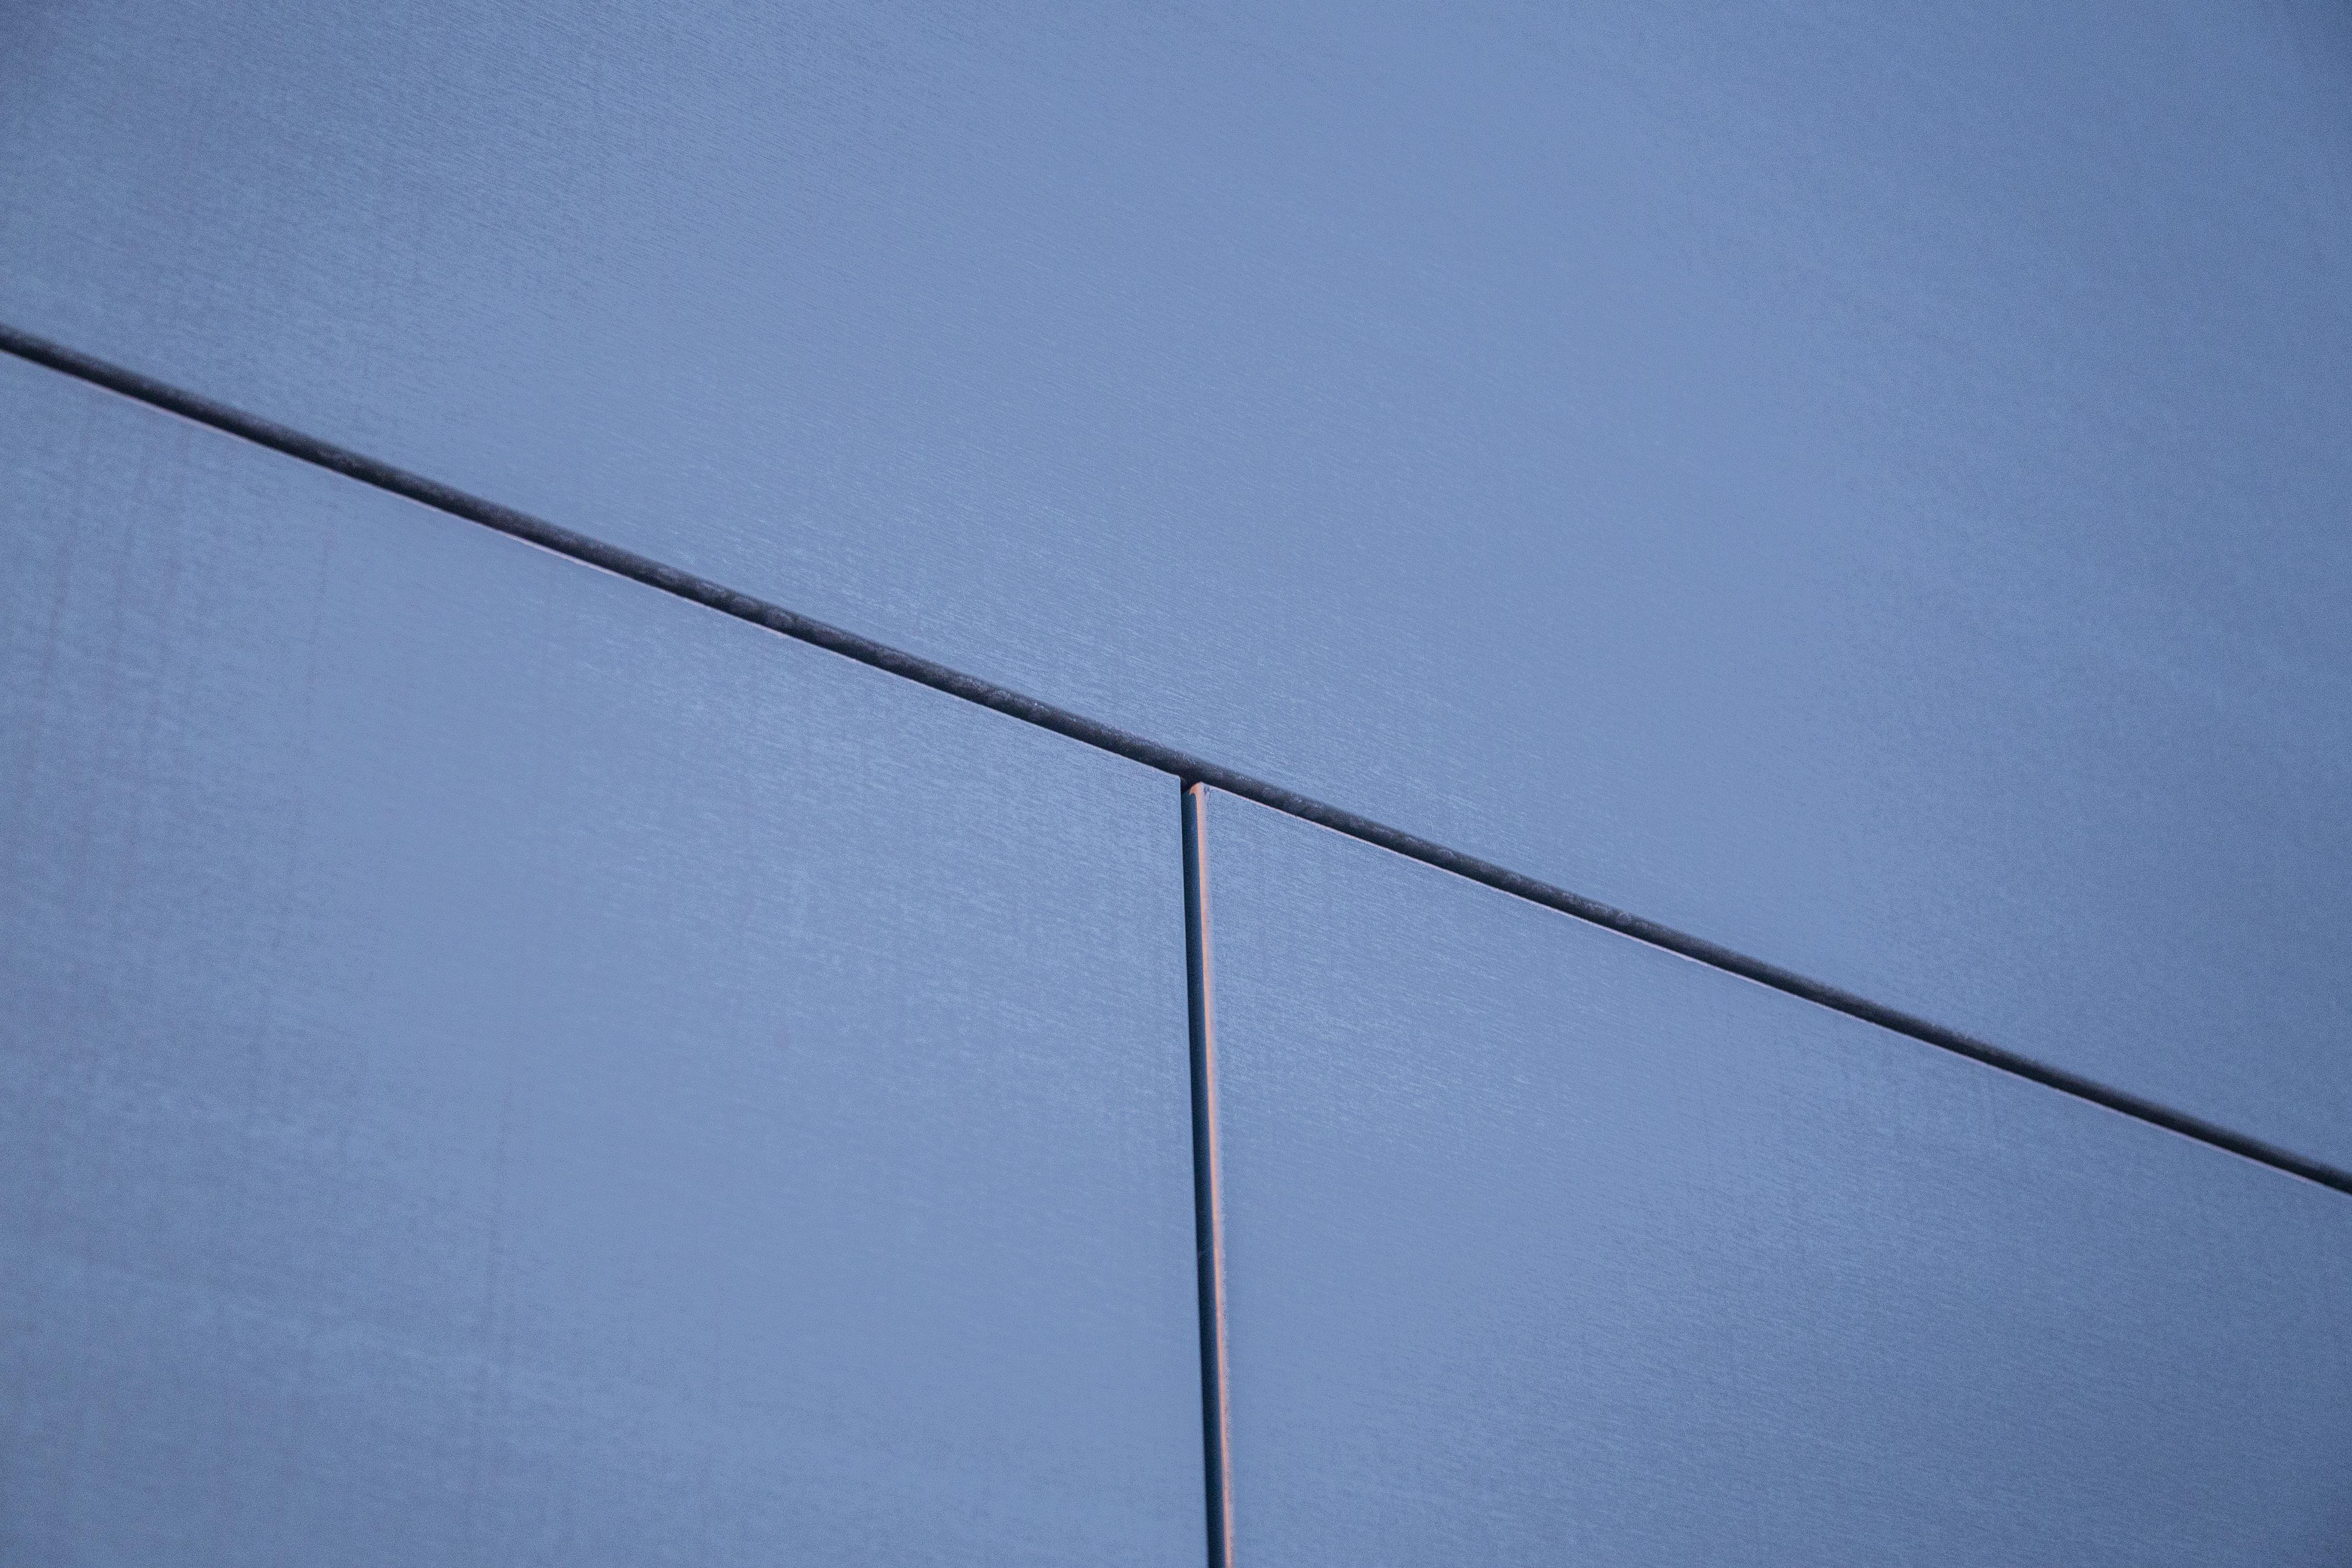 Zinc wall panel detail